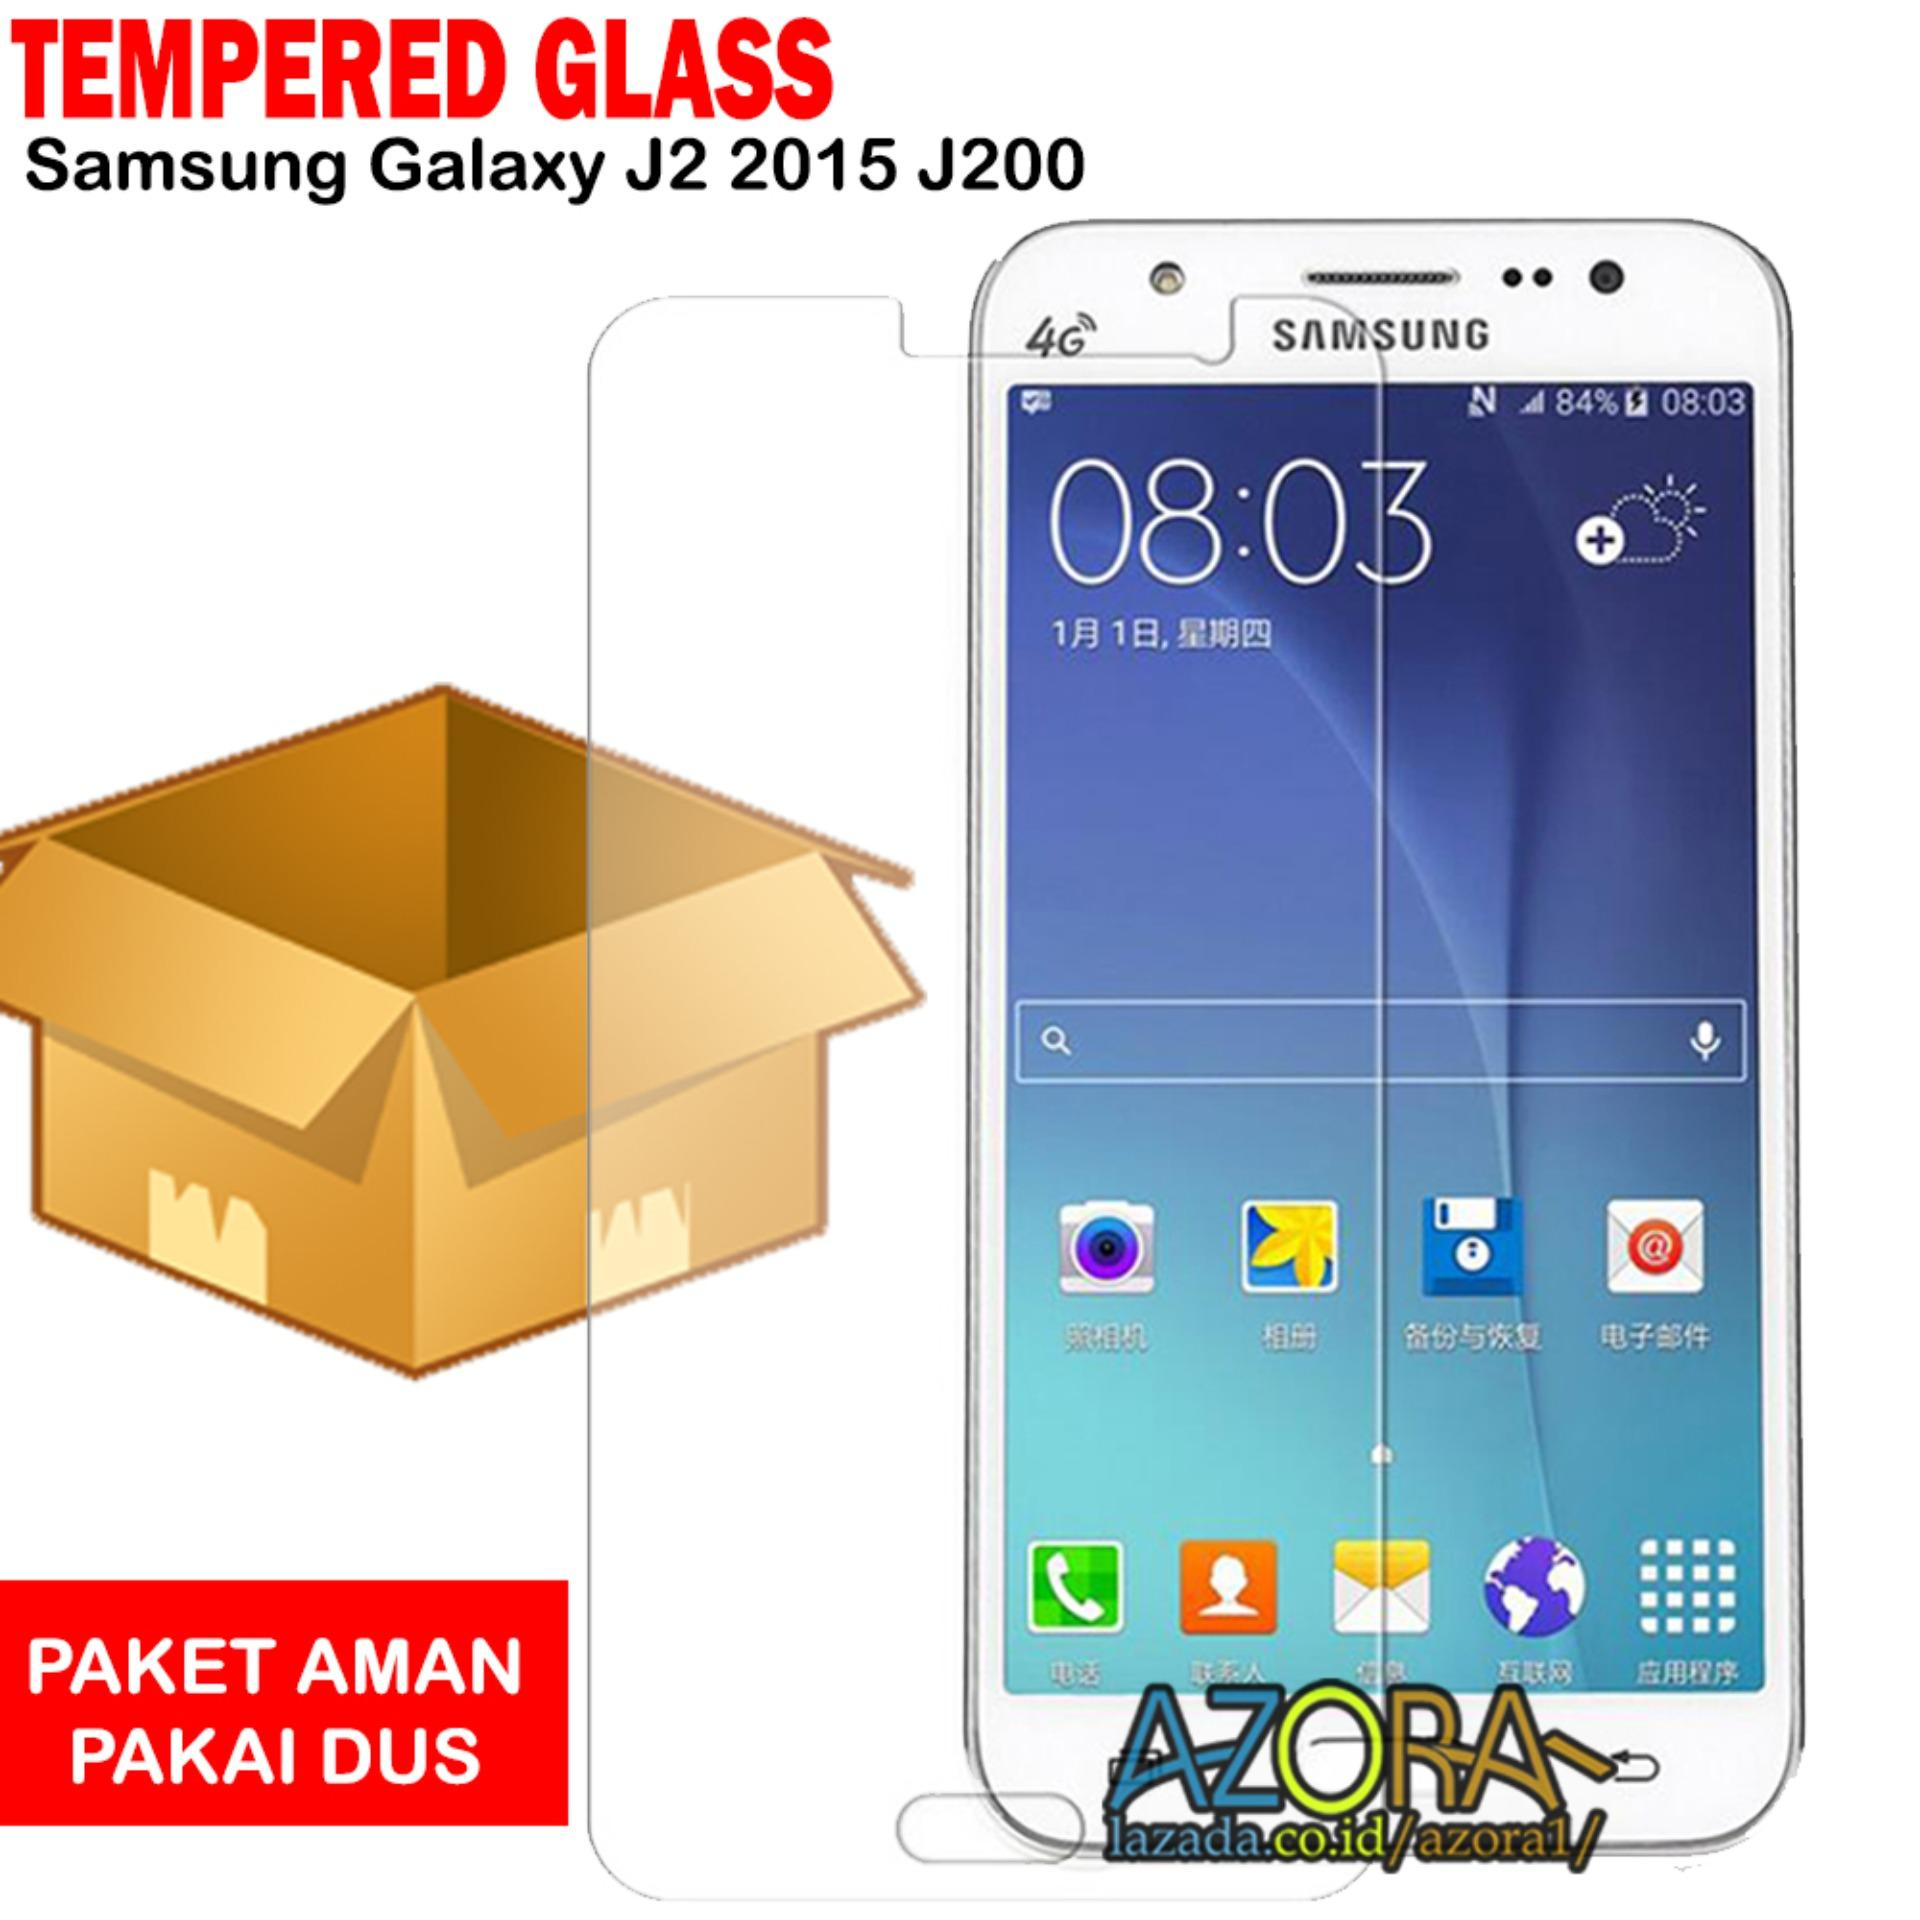 Tempered Glass Samsung Galaxy J2 2015 J200 Screen Protector Pelindung Layar Kaca Anti Gores - Bening